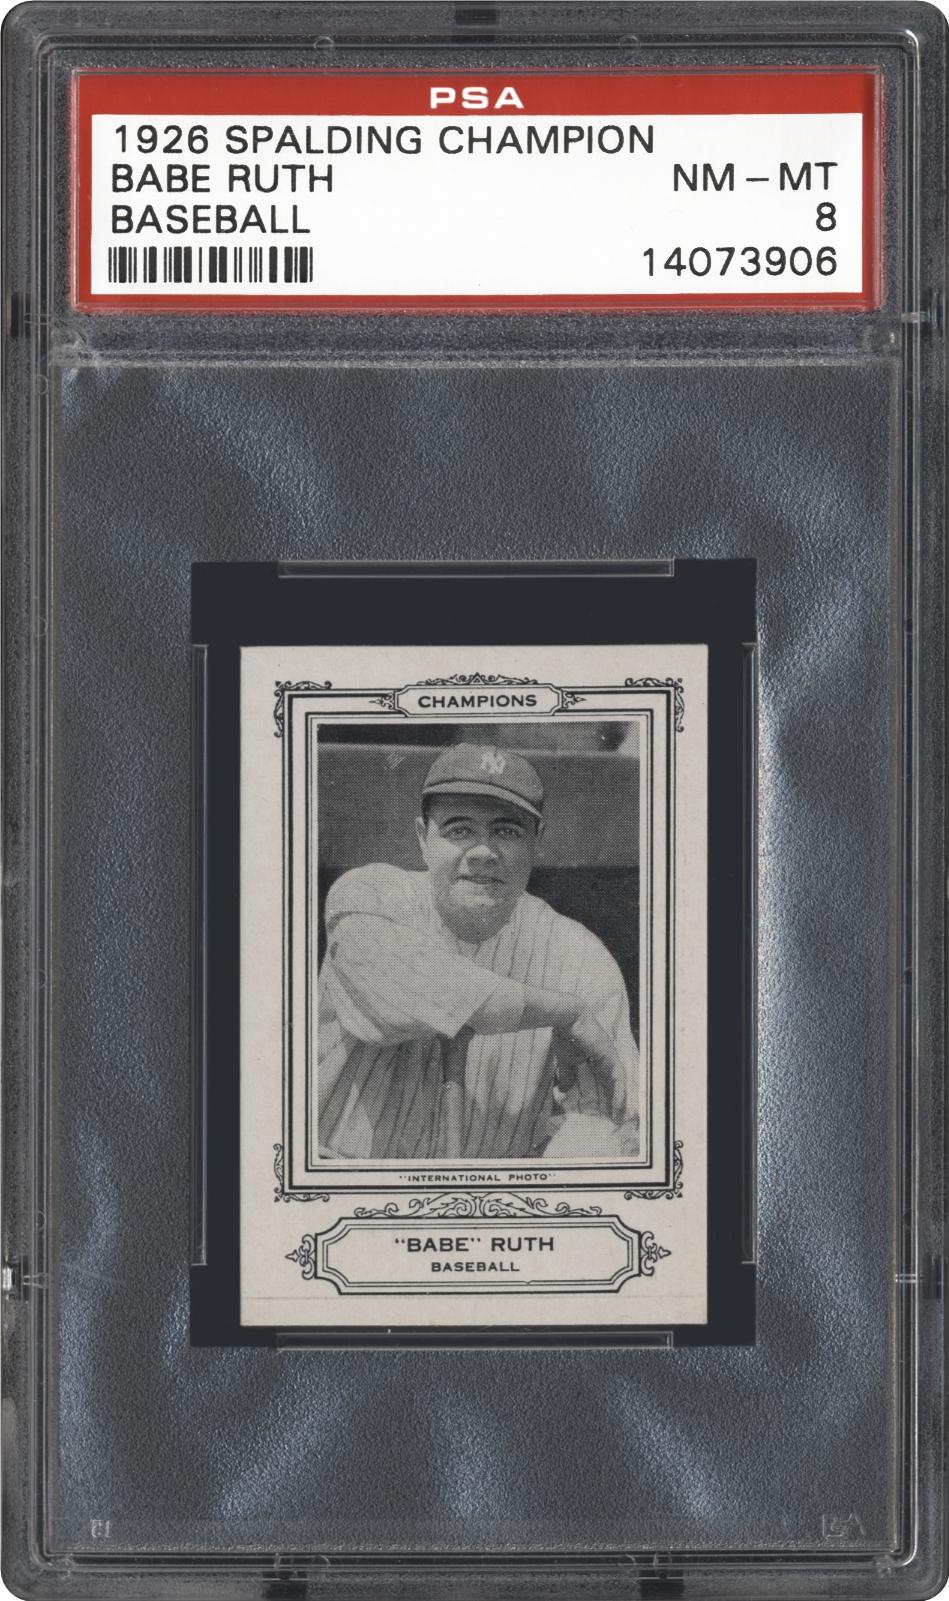 Babe Ruth Baseball Card Front And Back